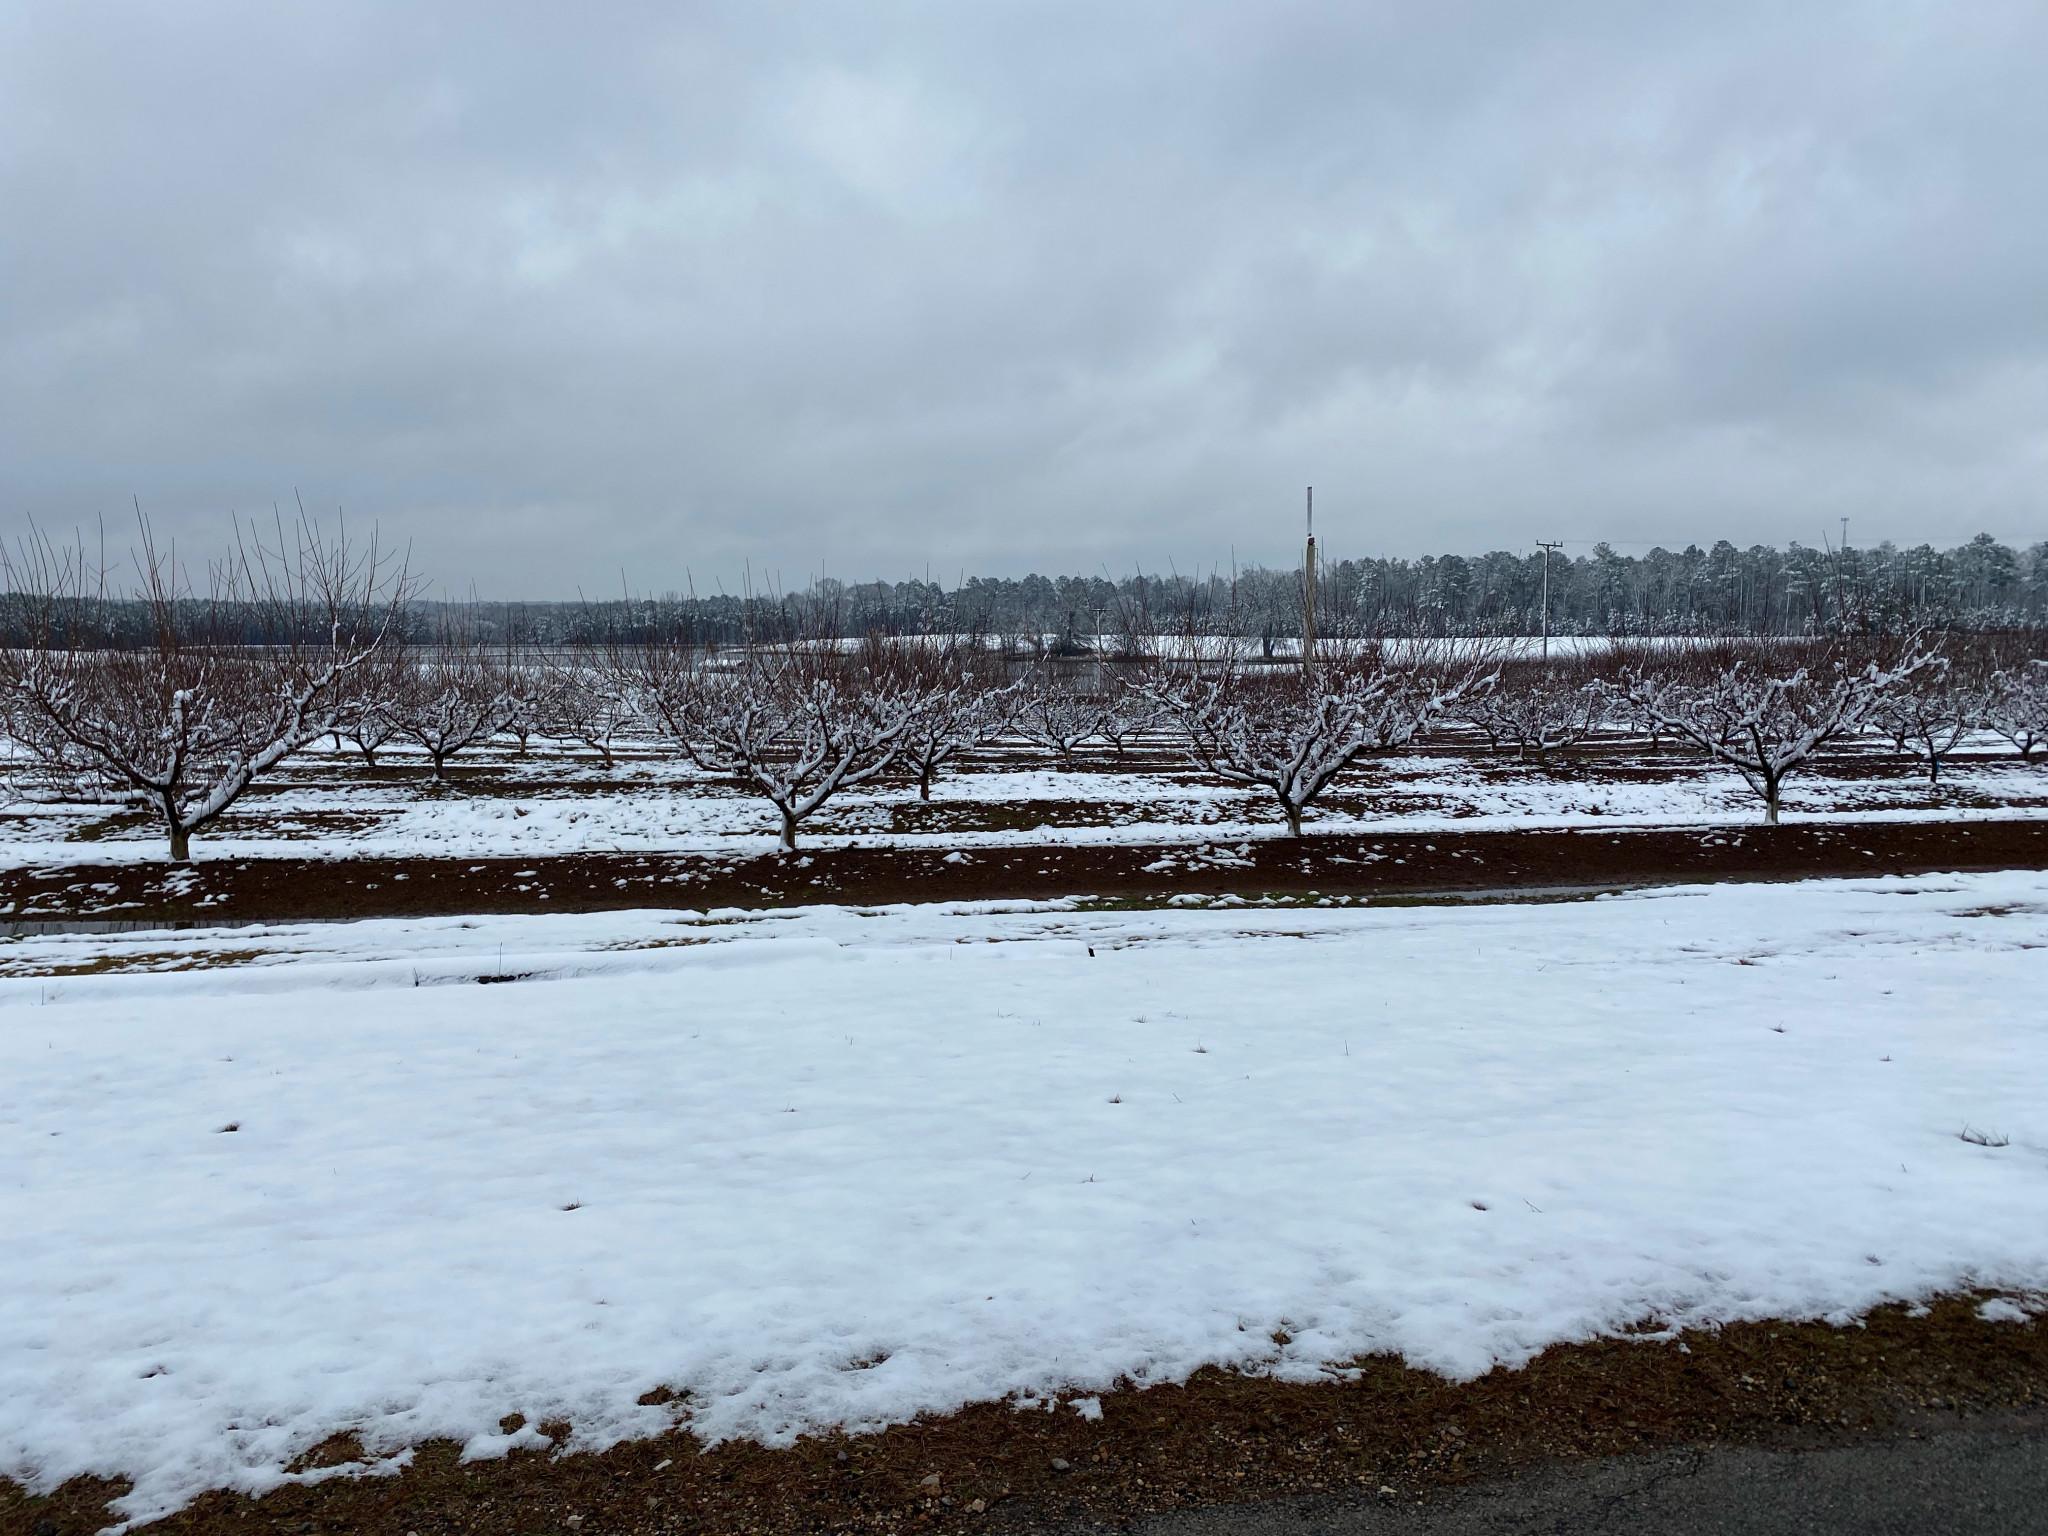 The Ruston Peach Orchard